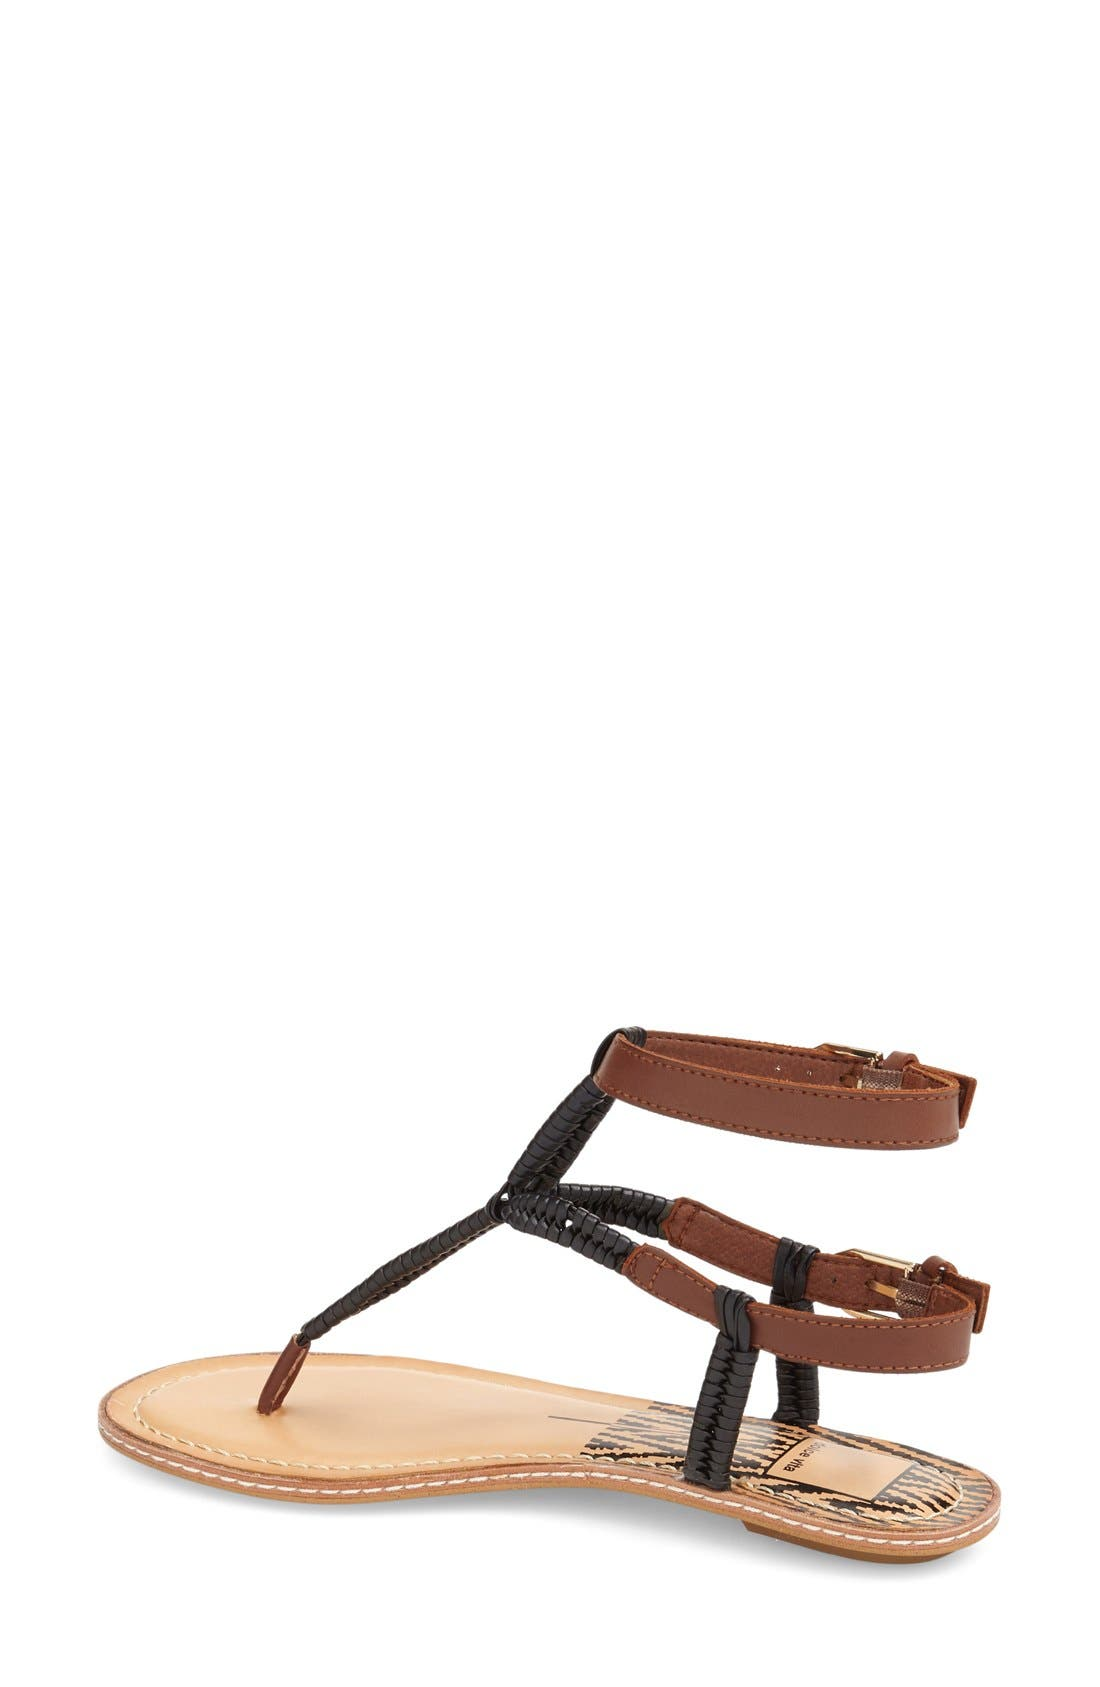 Alternate Image 2  - Dolce Vita 'Kendra' Flat Sandal (Women)